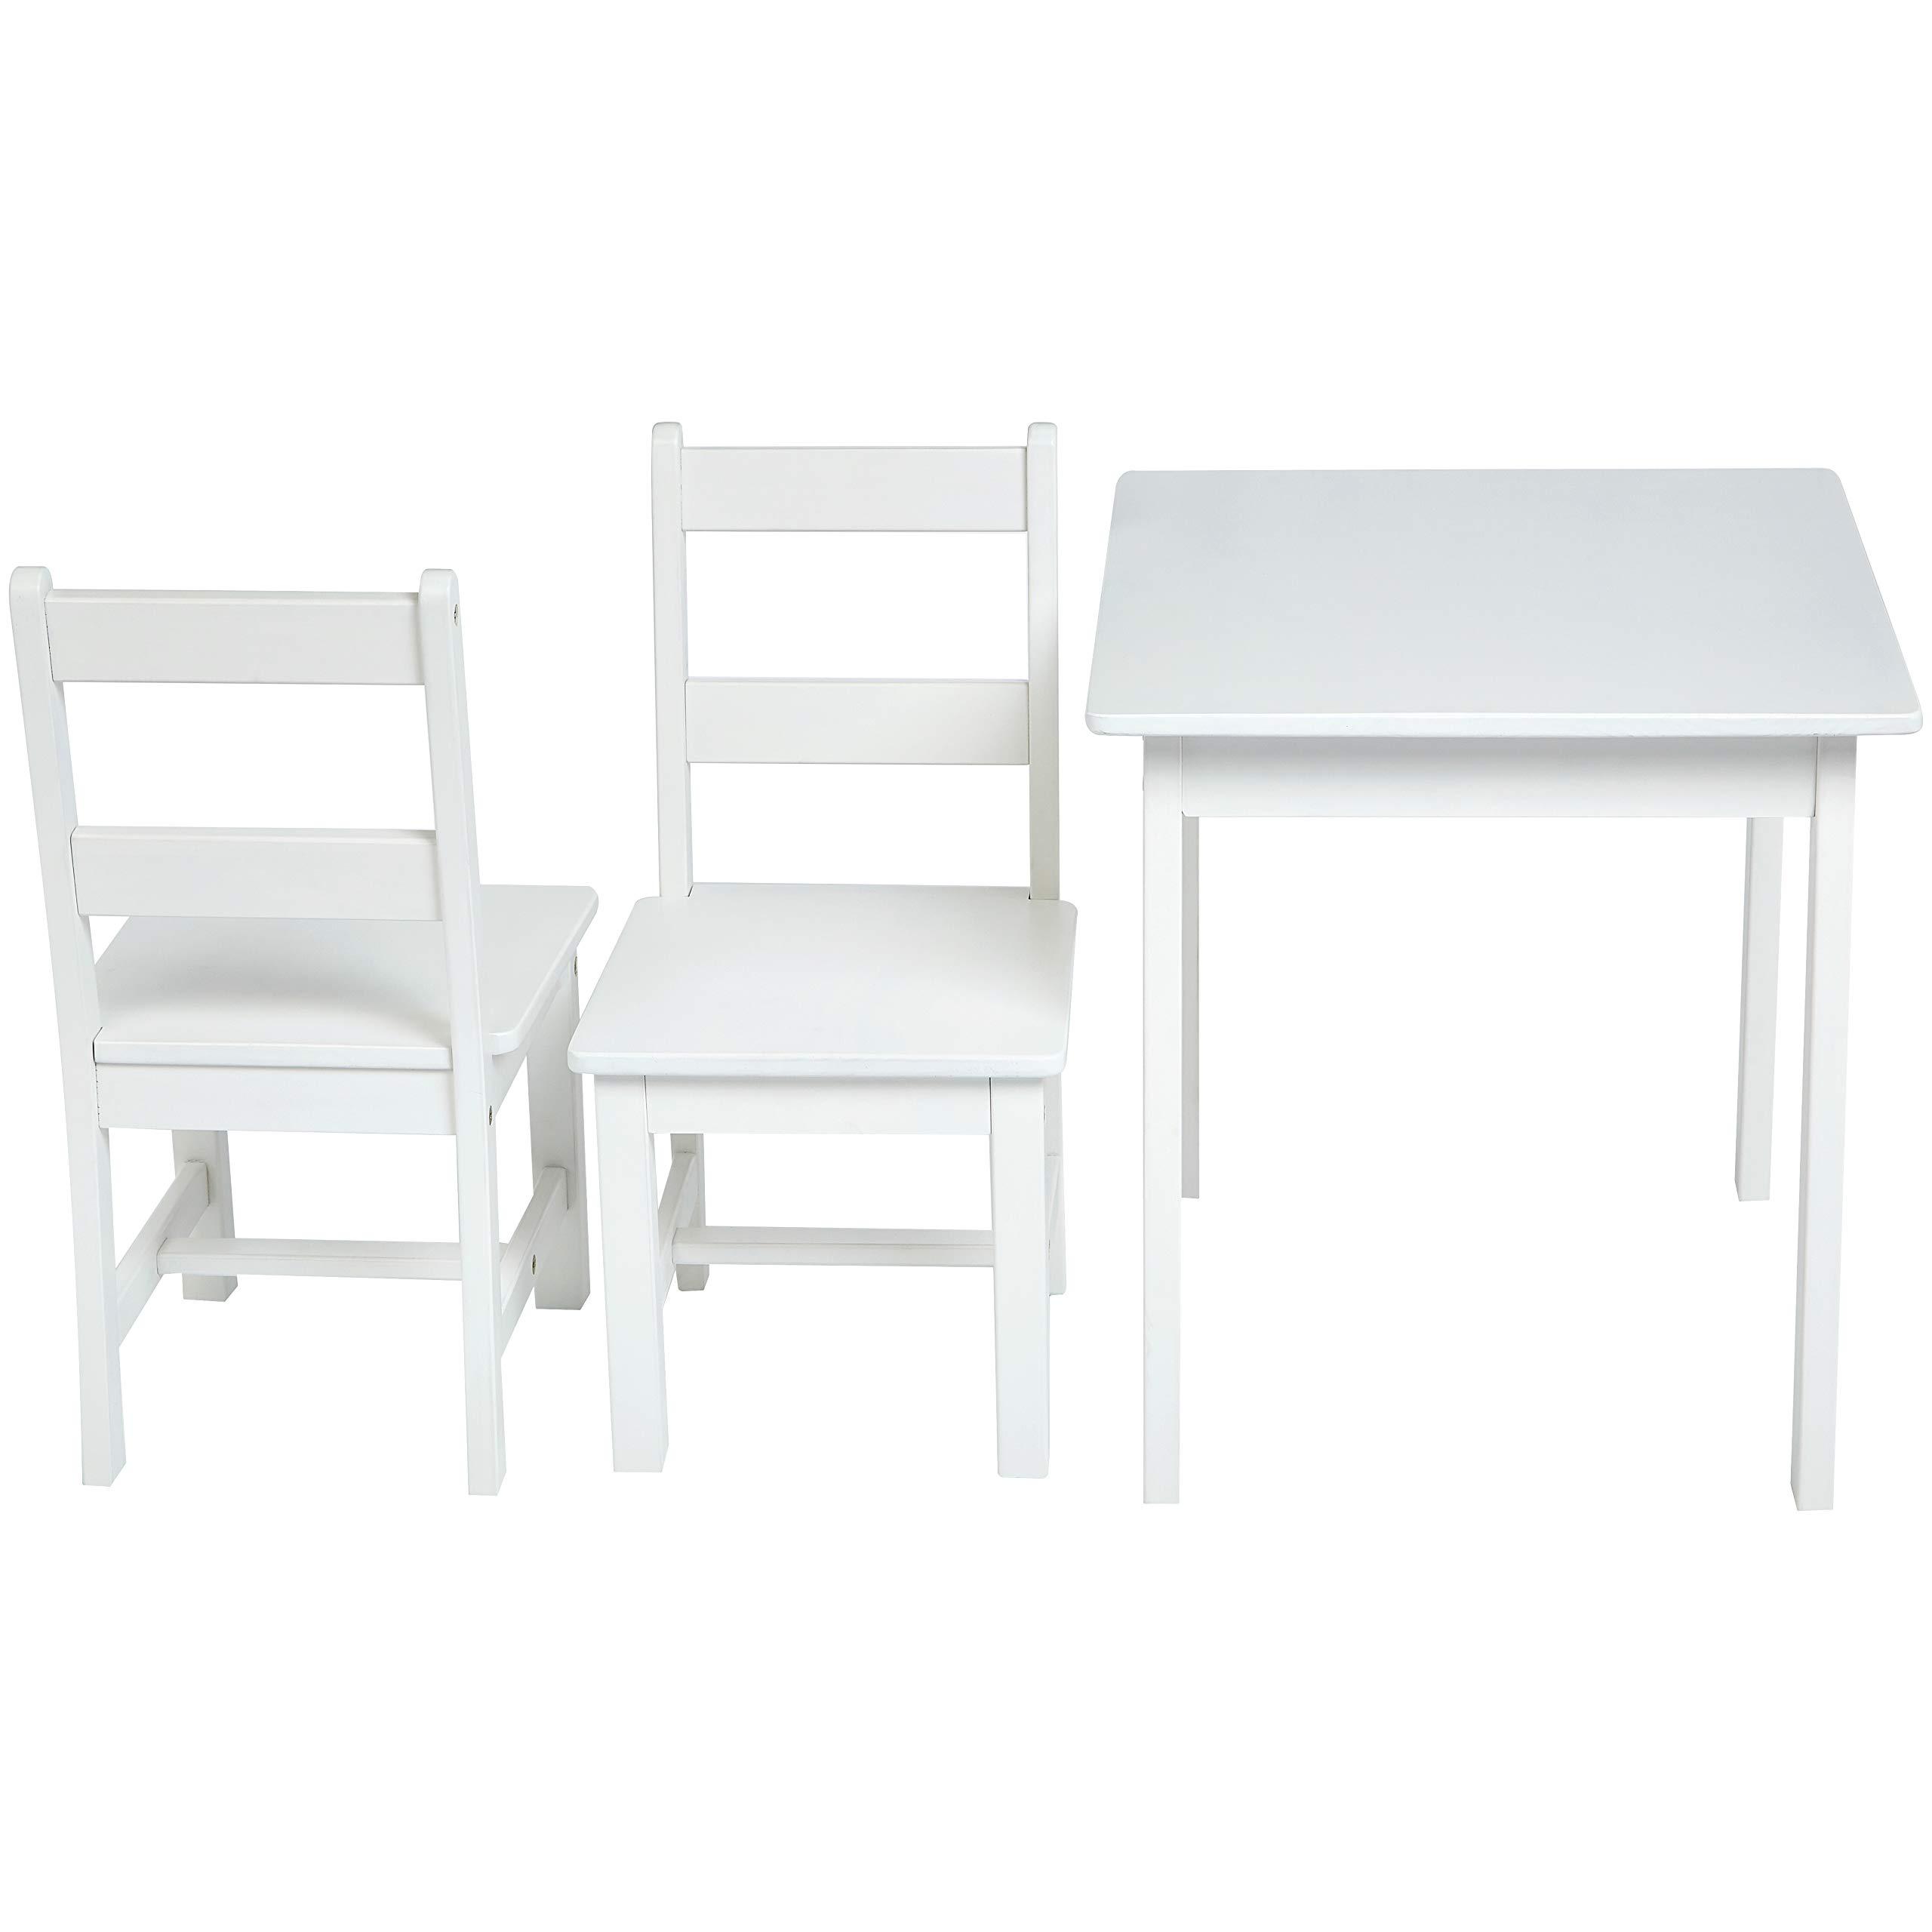 AmazonBasics Kids Solid Wood Table and 2 Chair Set, White by AmazonBasics (Image #4)